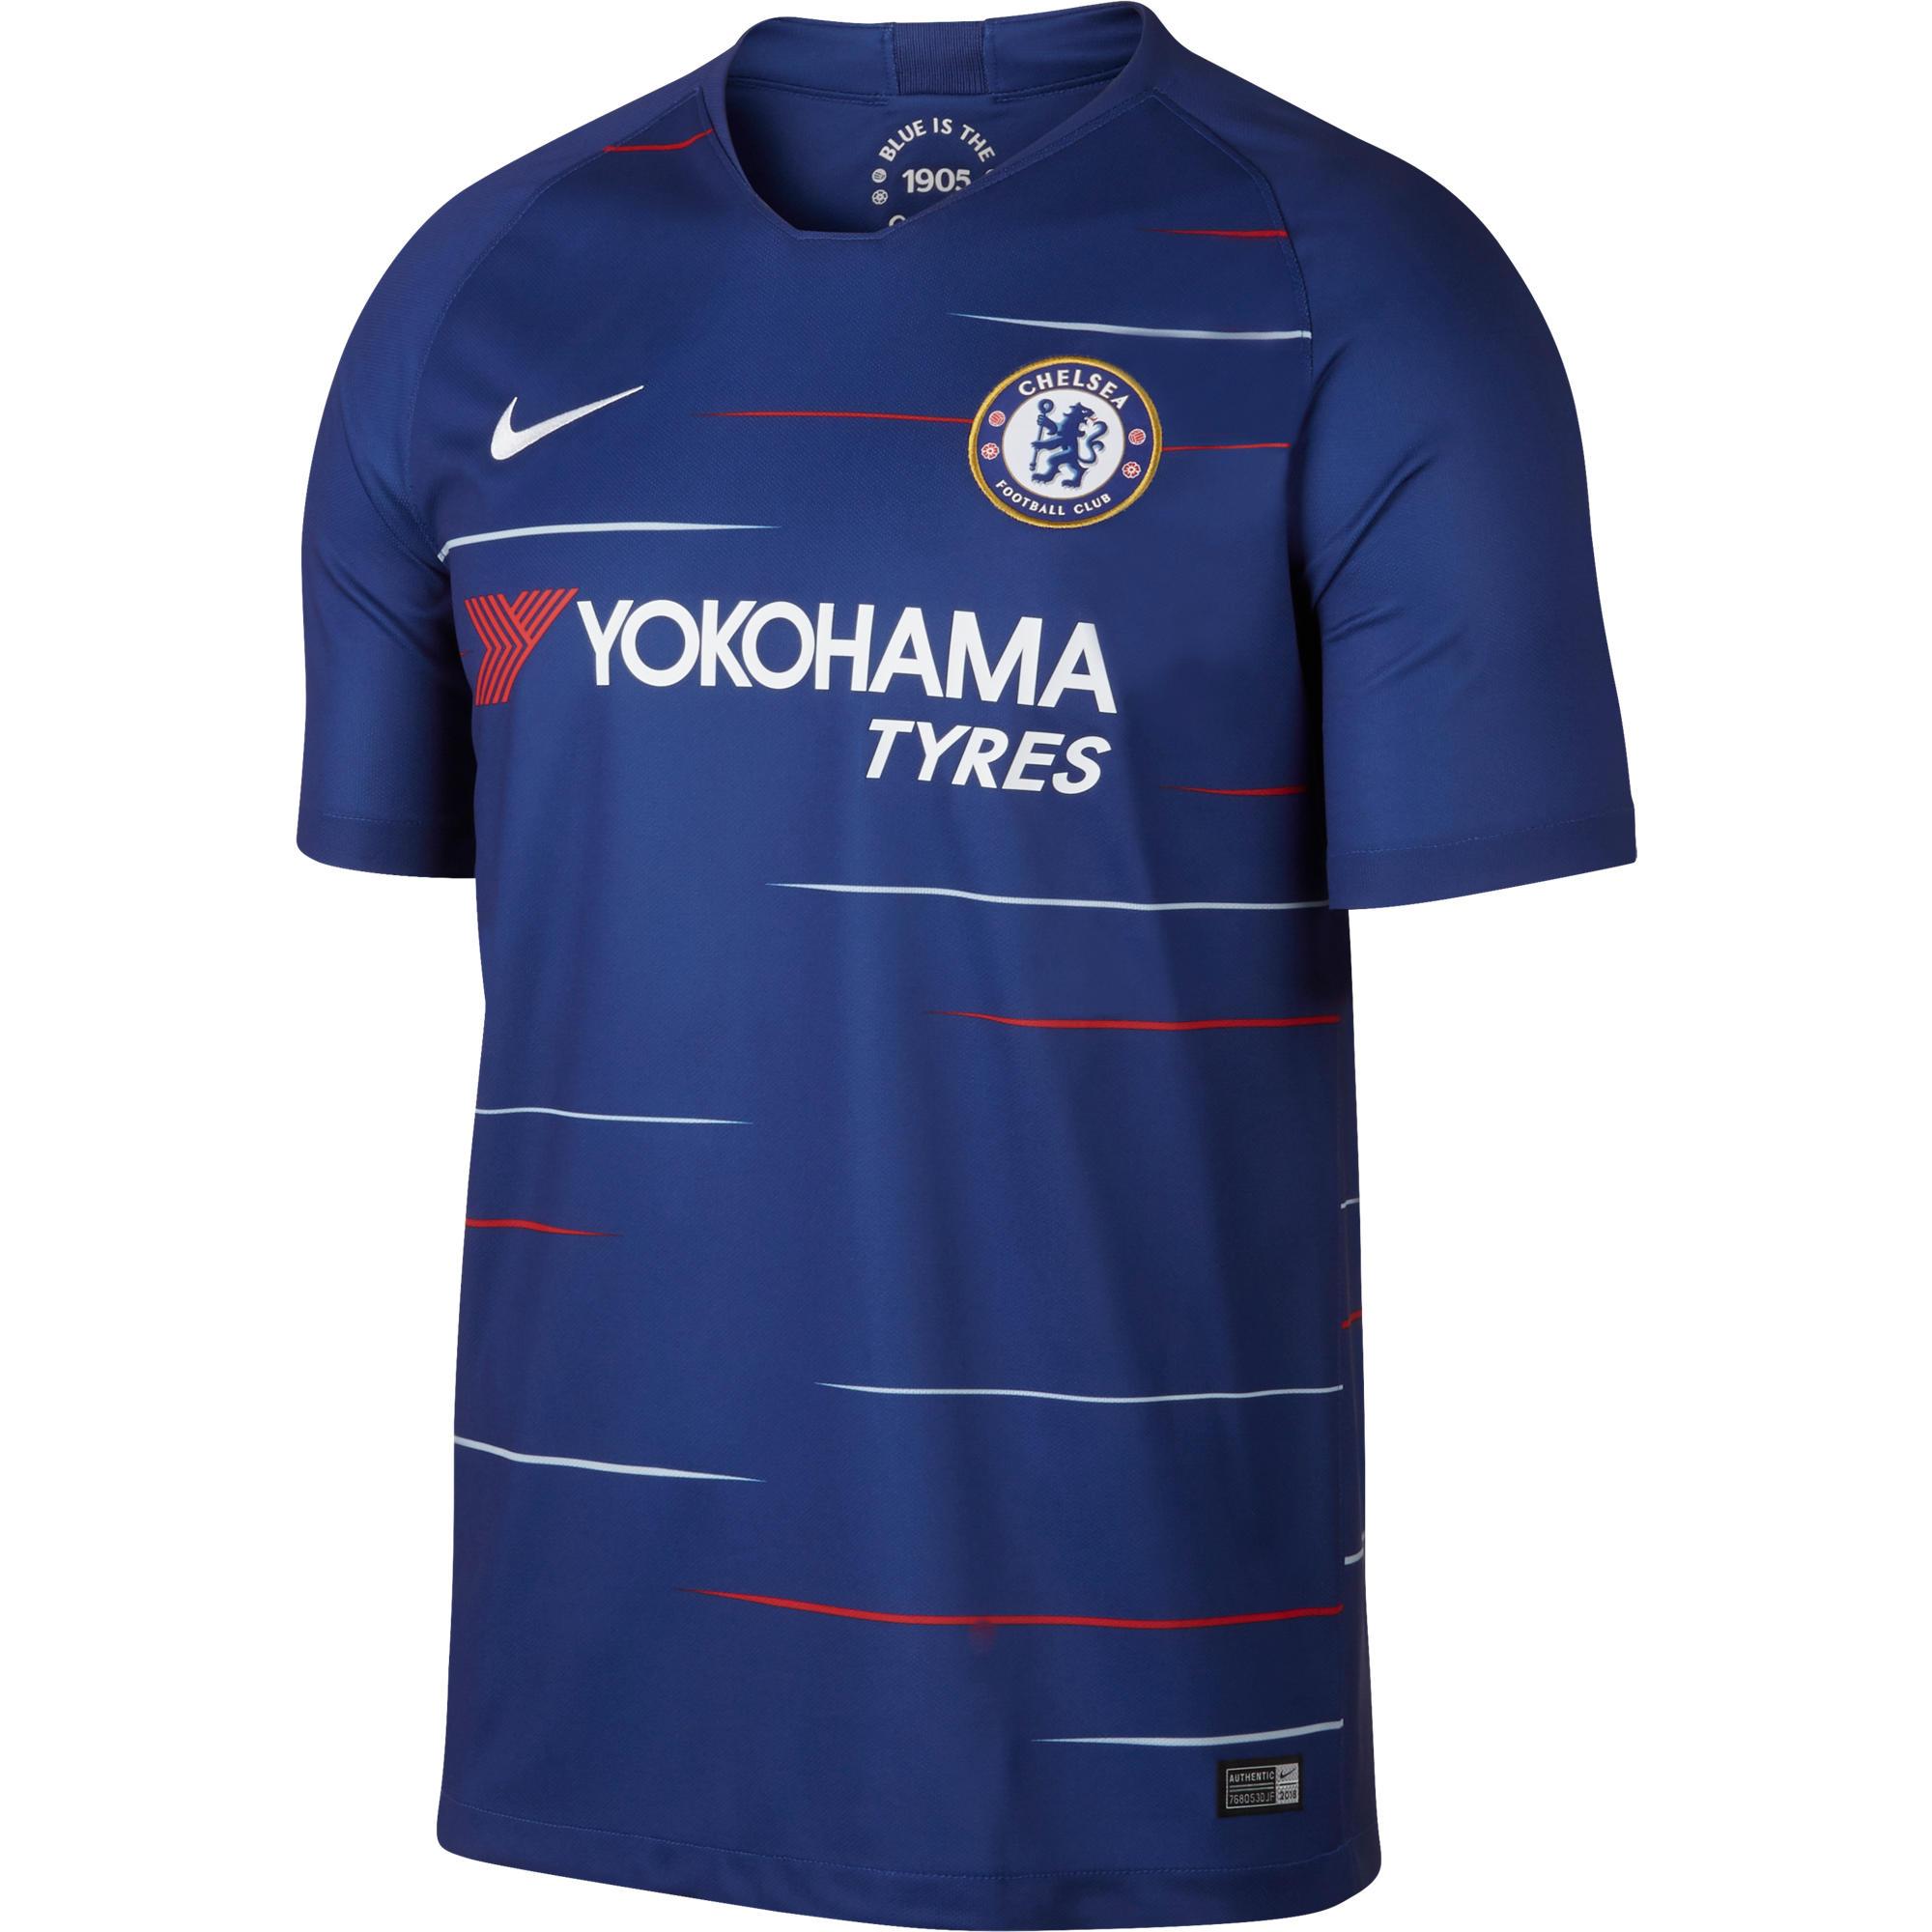 fd250c5858bca Camiseta de Fútbol Nike oficial Chelsea 1ª equipación niños 2018 2019